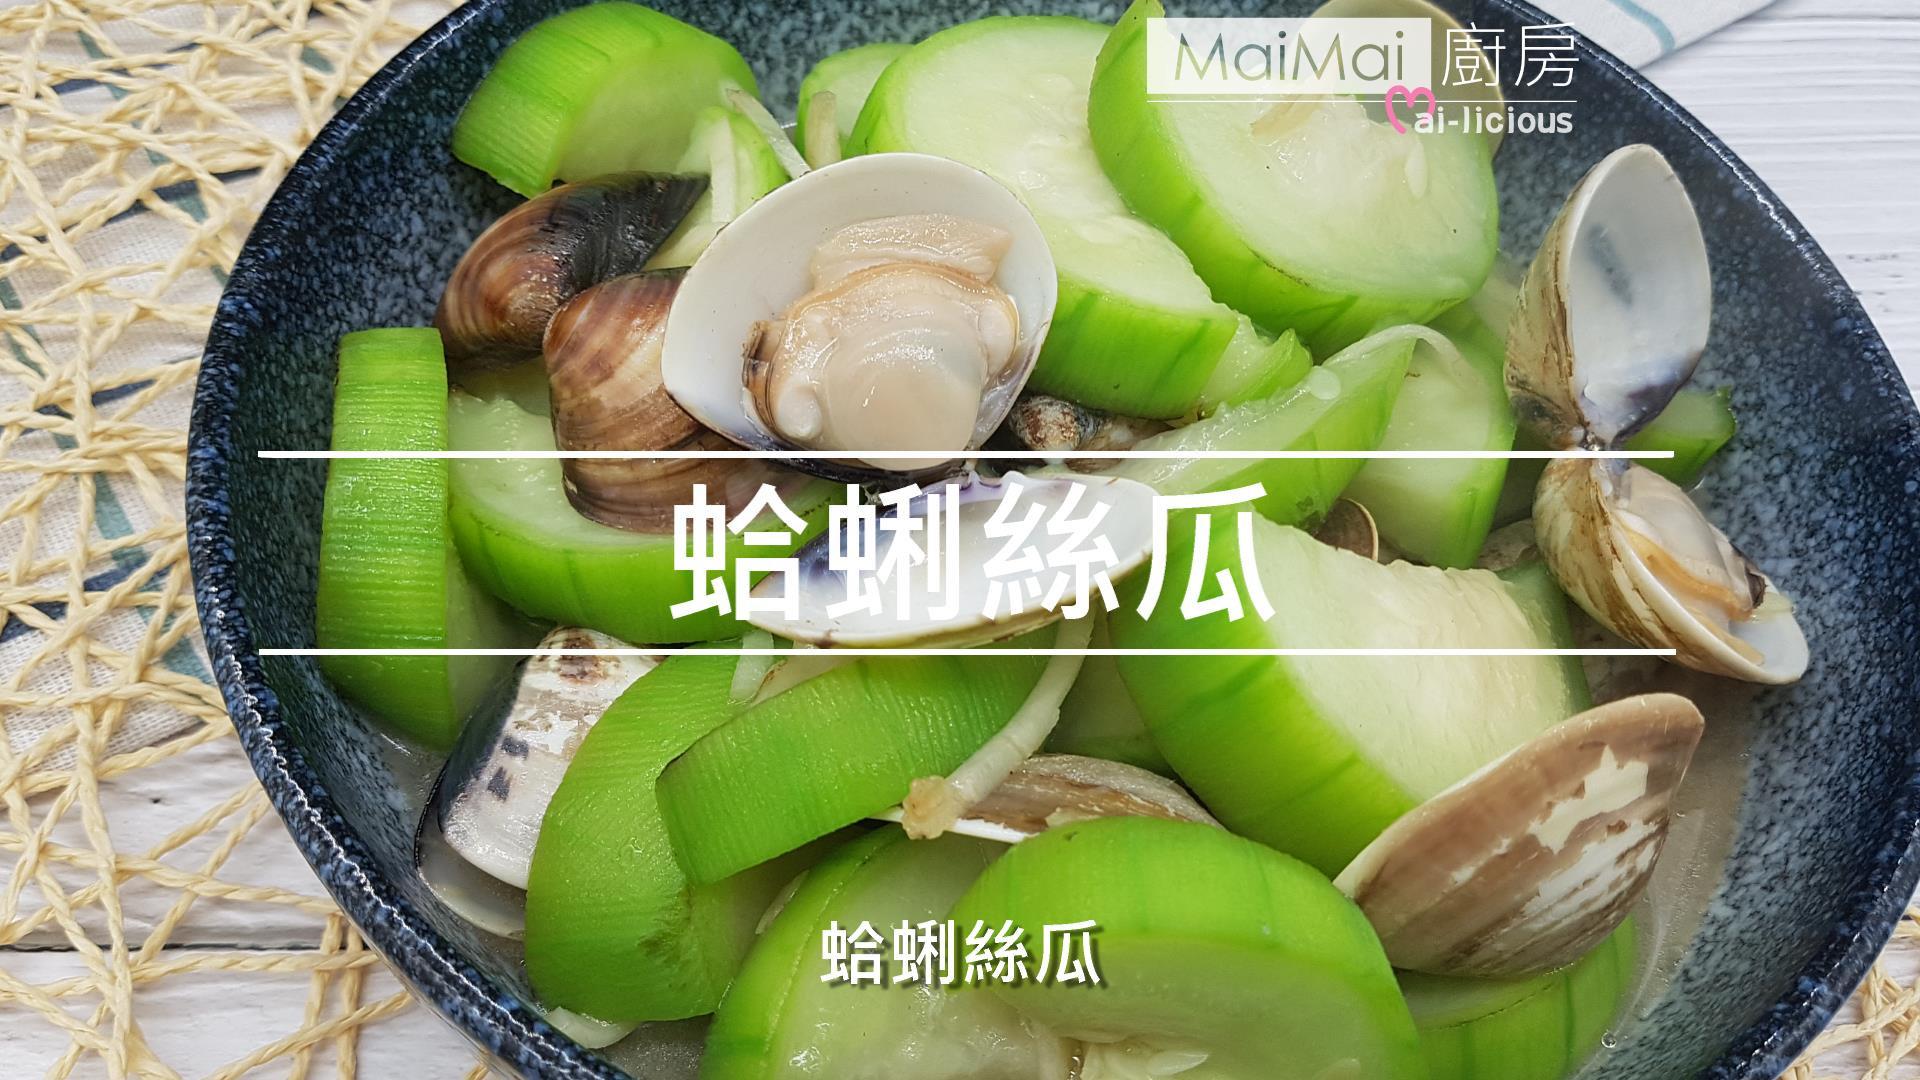 【MaiMai廚房】絲瓜蛤蜊